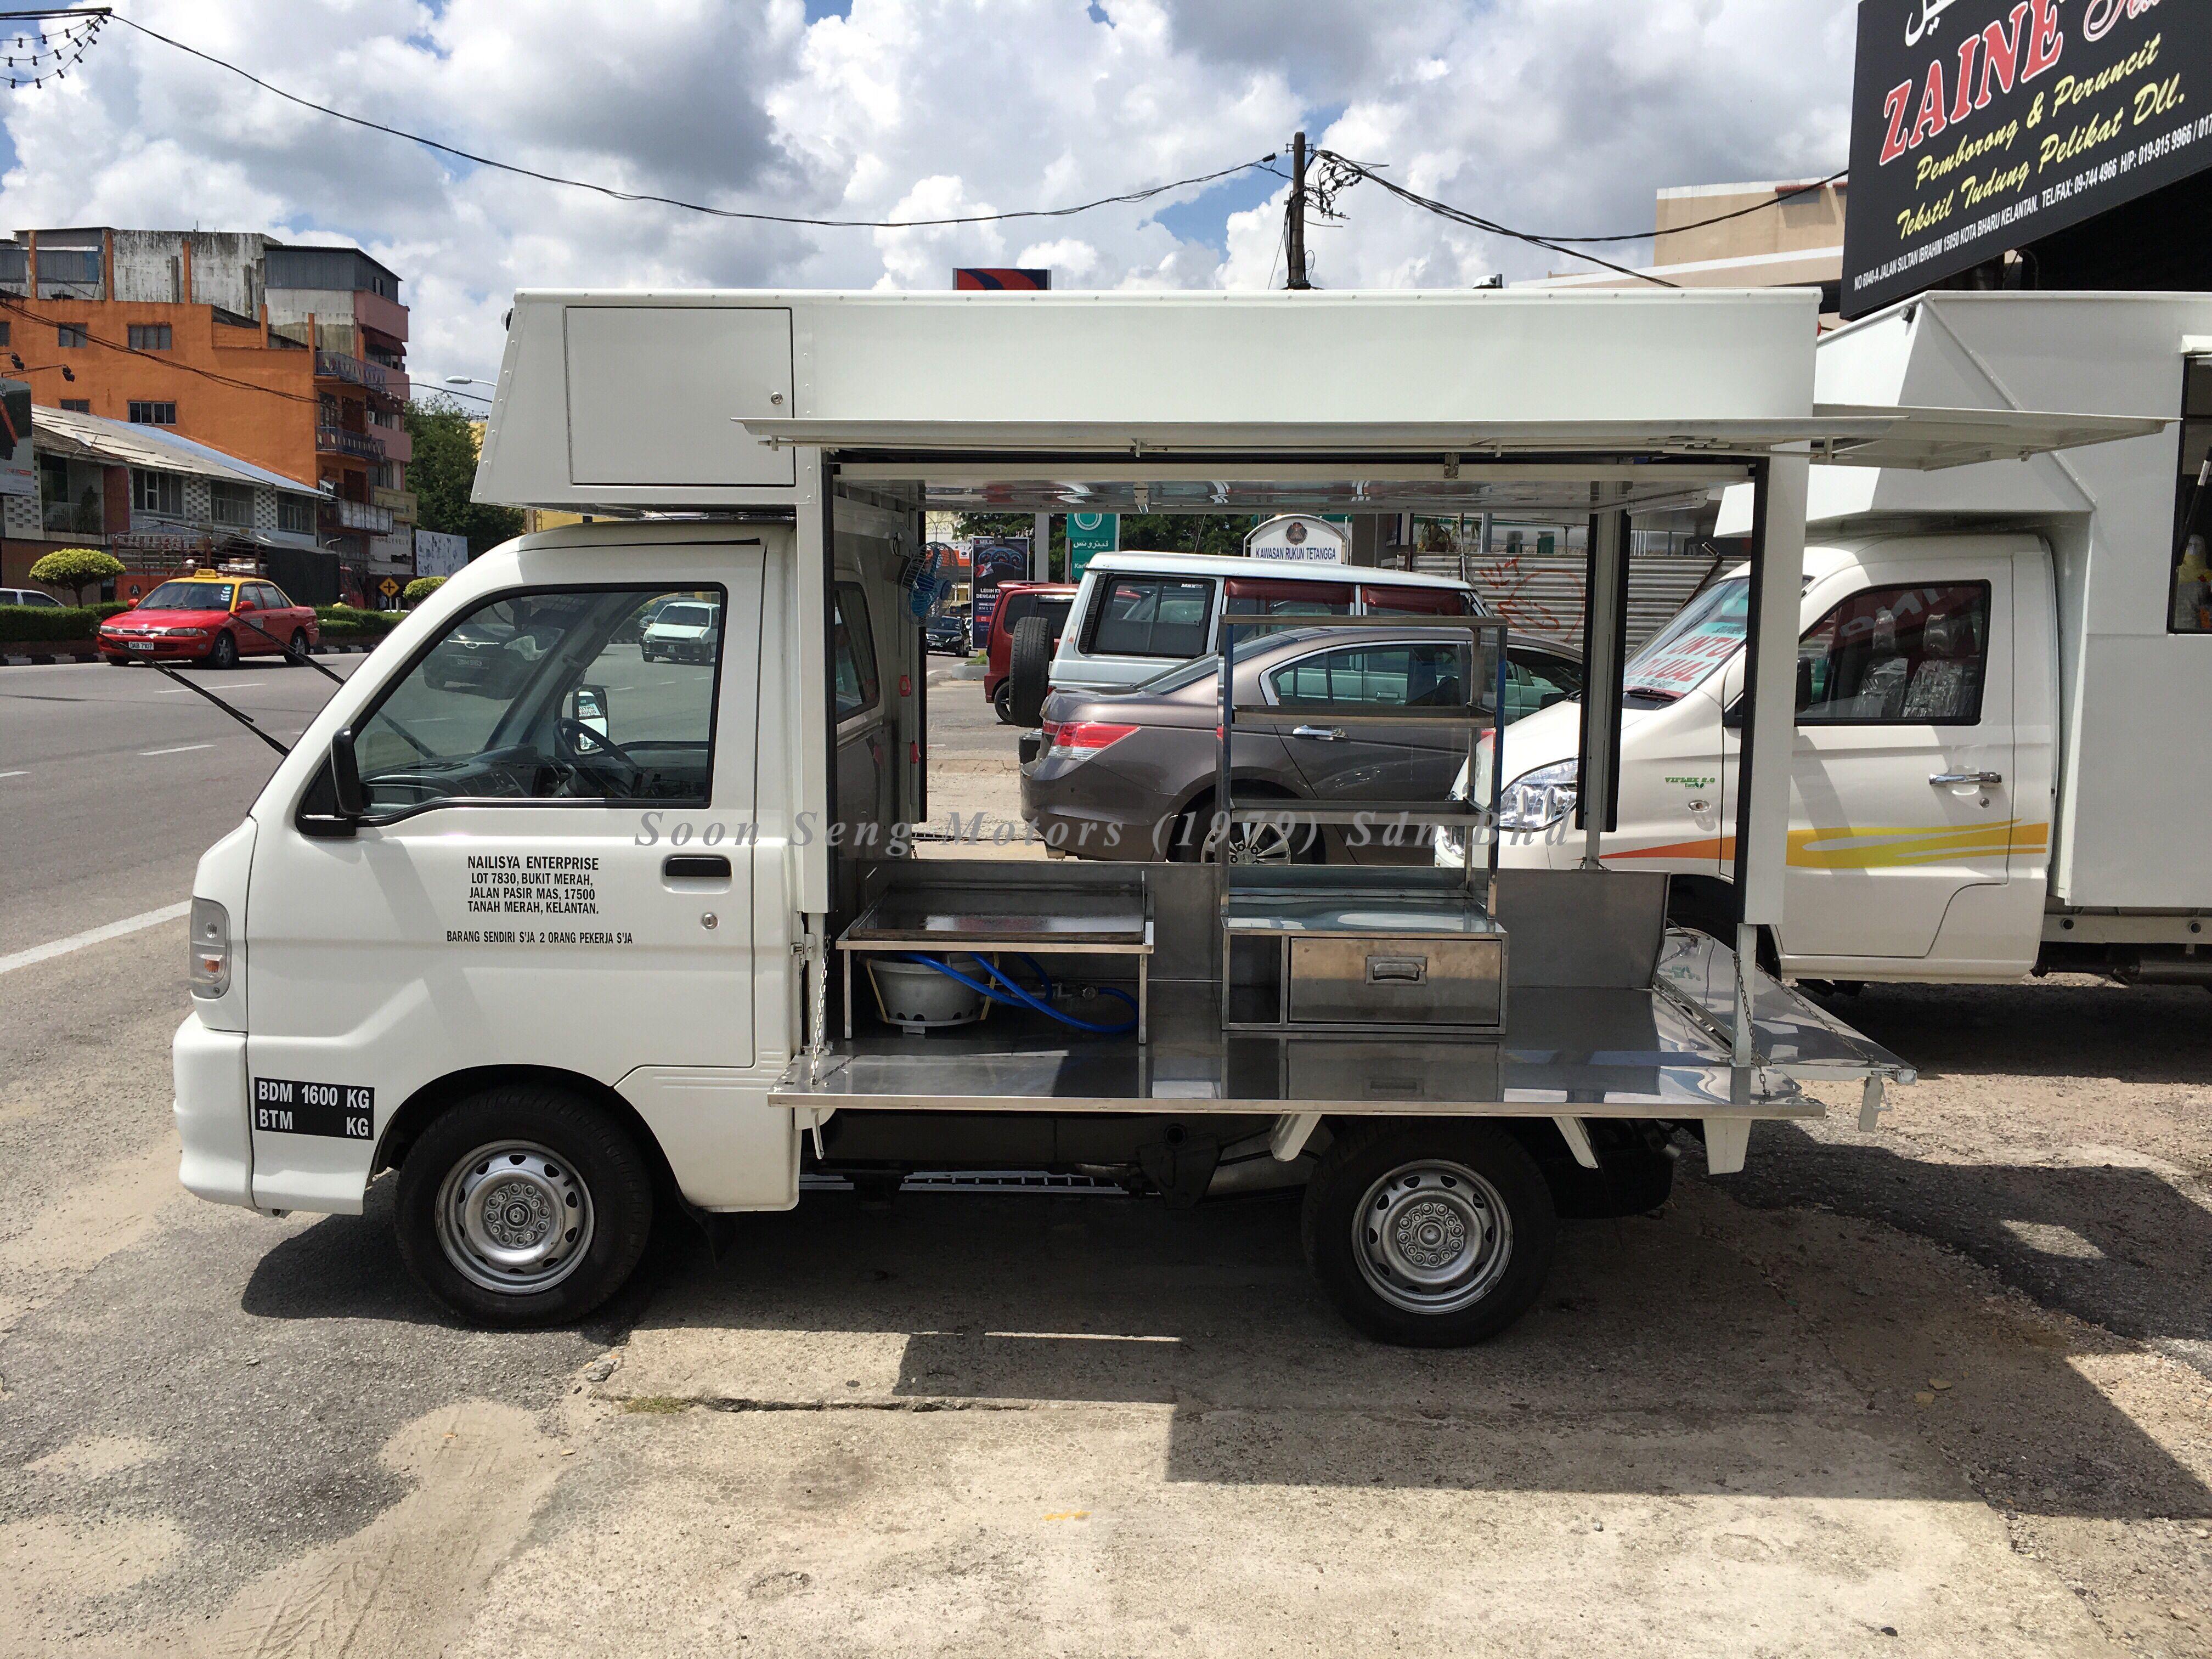 Lori Pasar Malam Suzuki Carry Daihatsu Recreational Vehicles